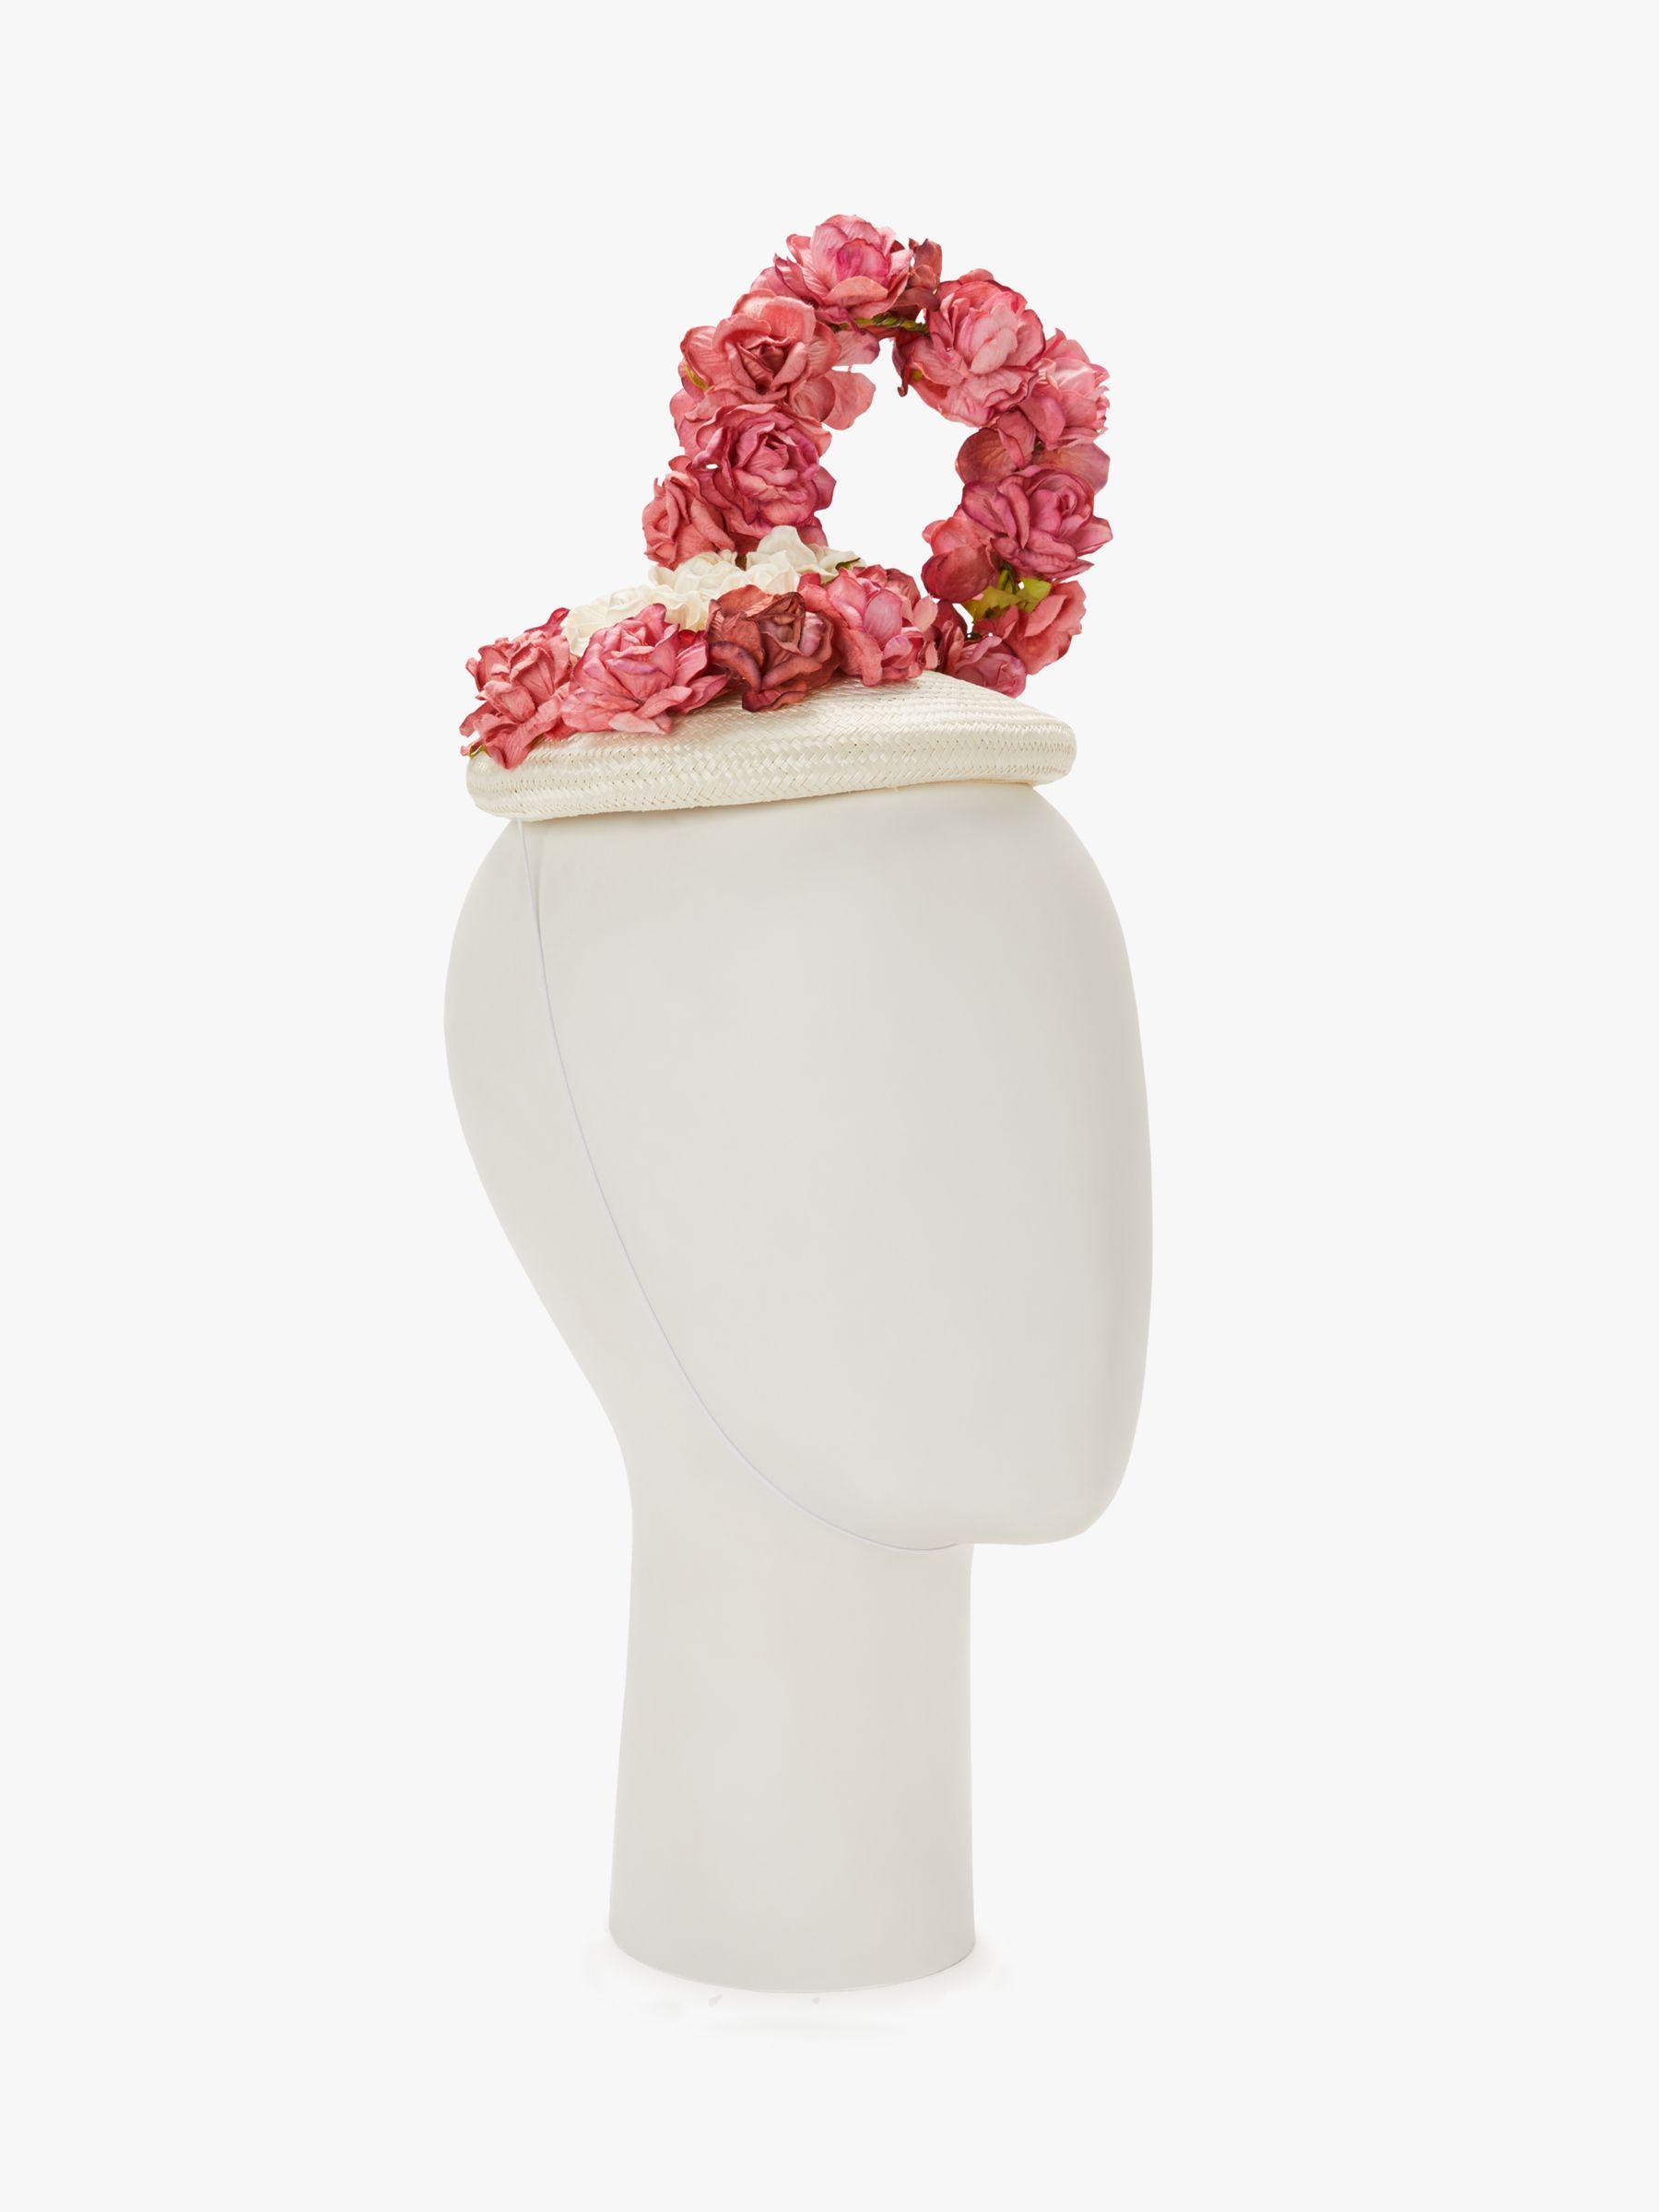 32d963d50c47e Bundle Maclaren Millinery Suzy Flower Wall Pillbox Fascinator in Pink - Lyst